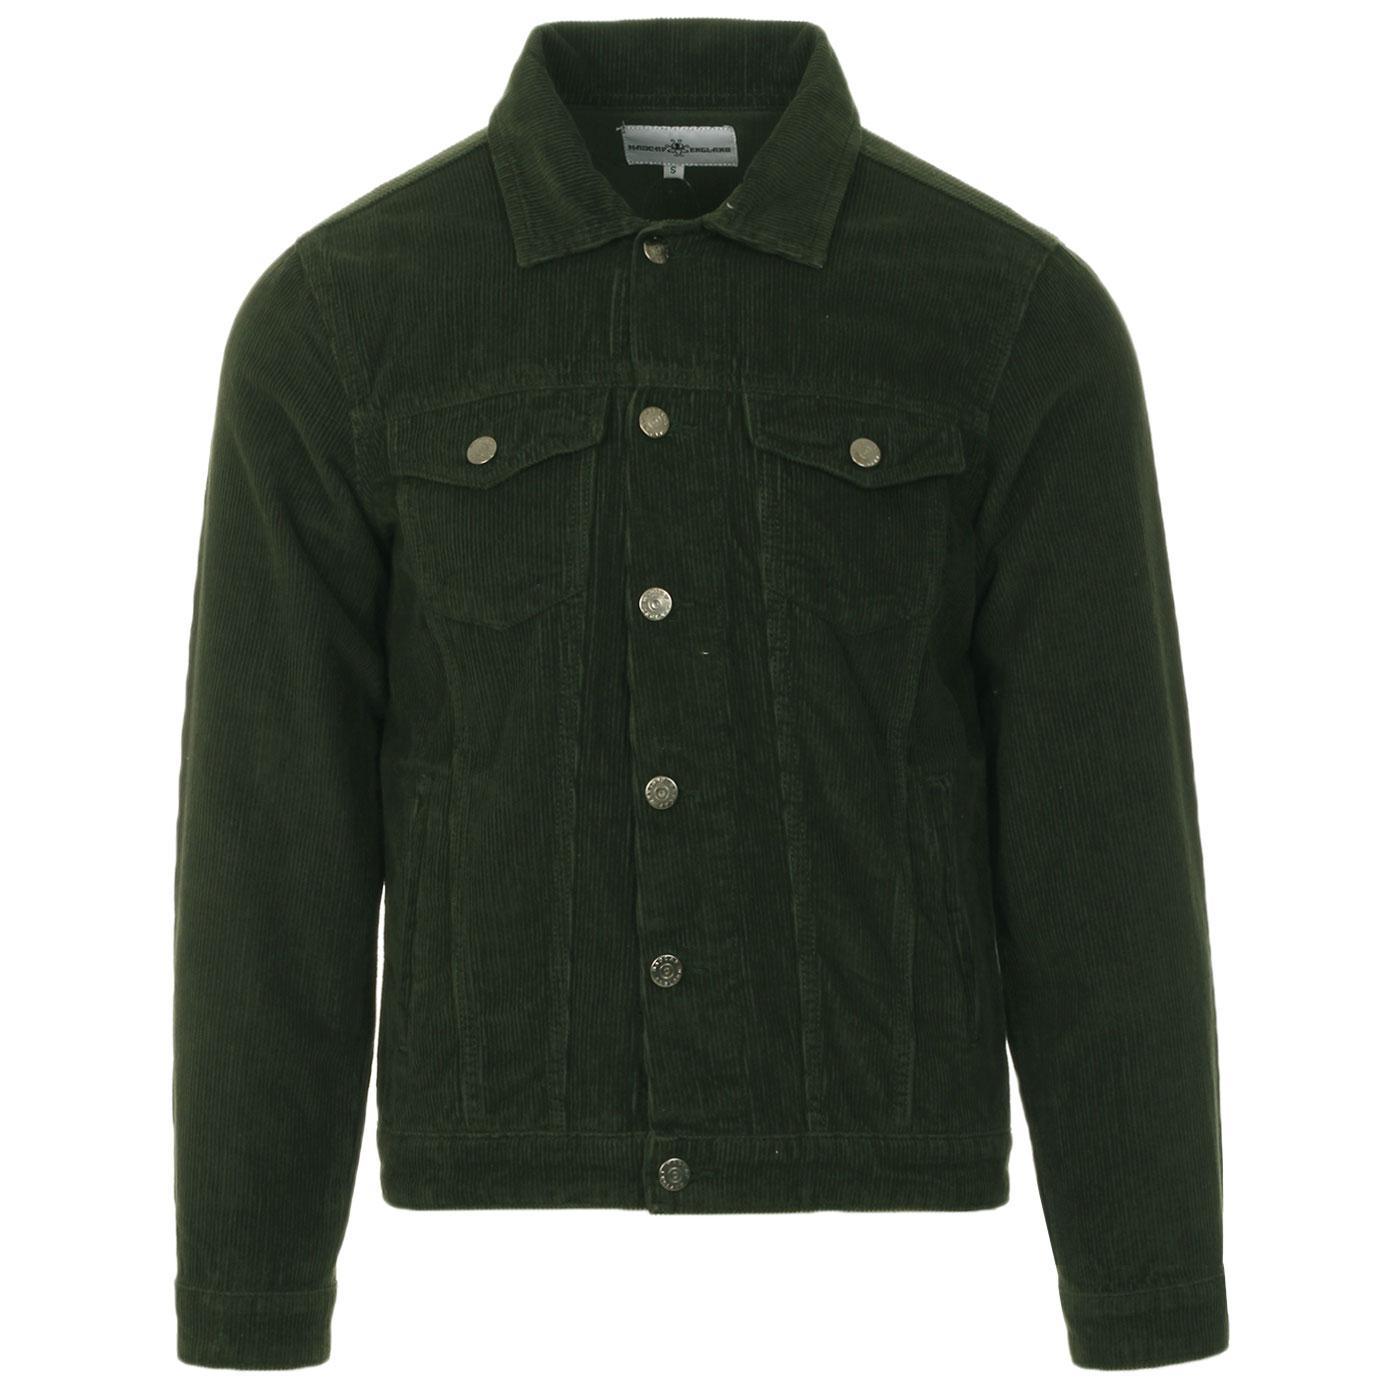 Woburn MADCAP ENGLAND Mod Cord Western Jacket (DF)